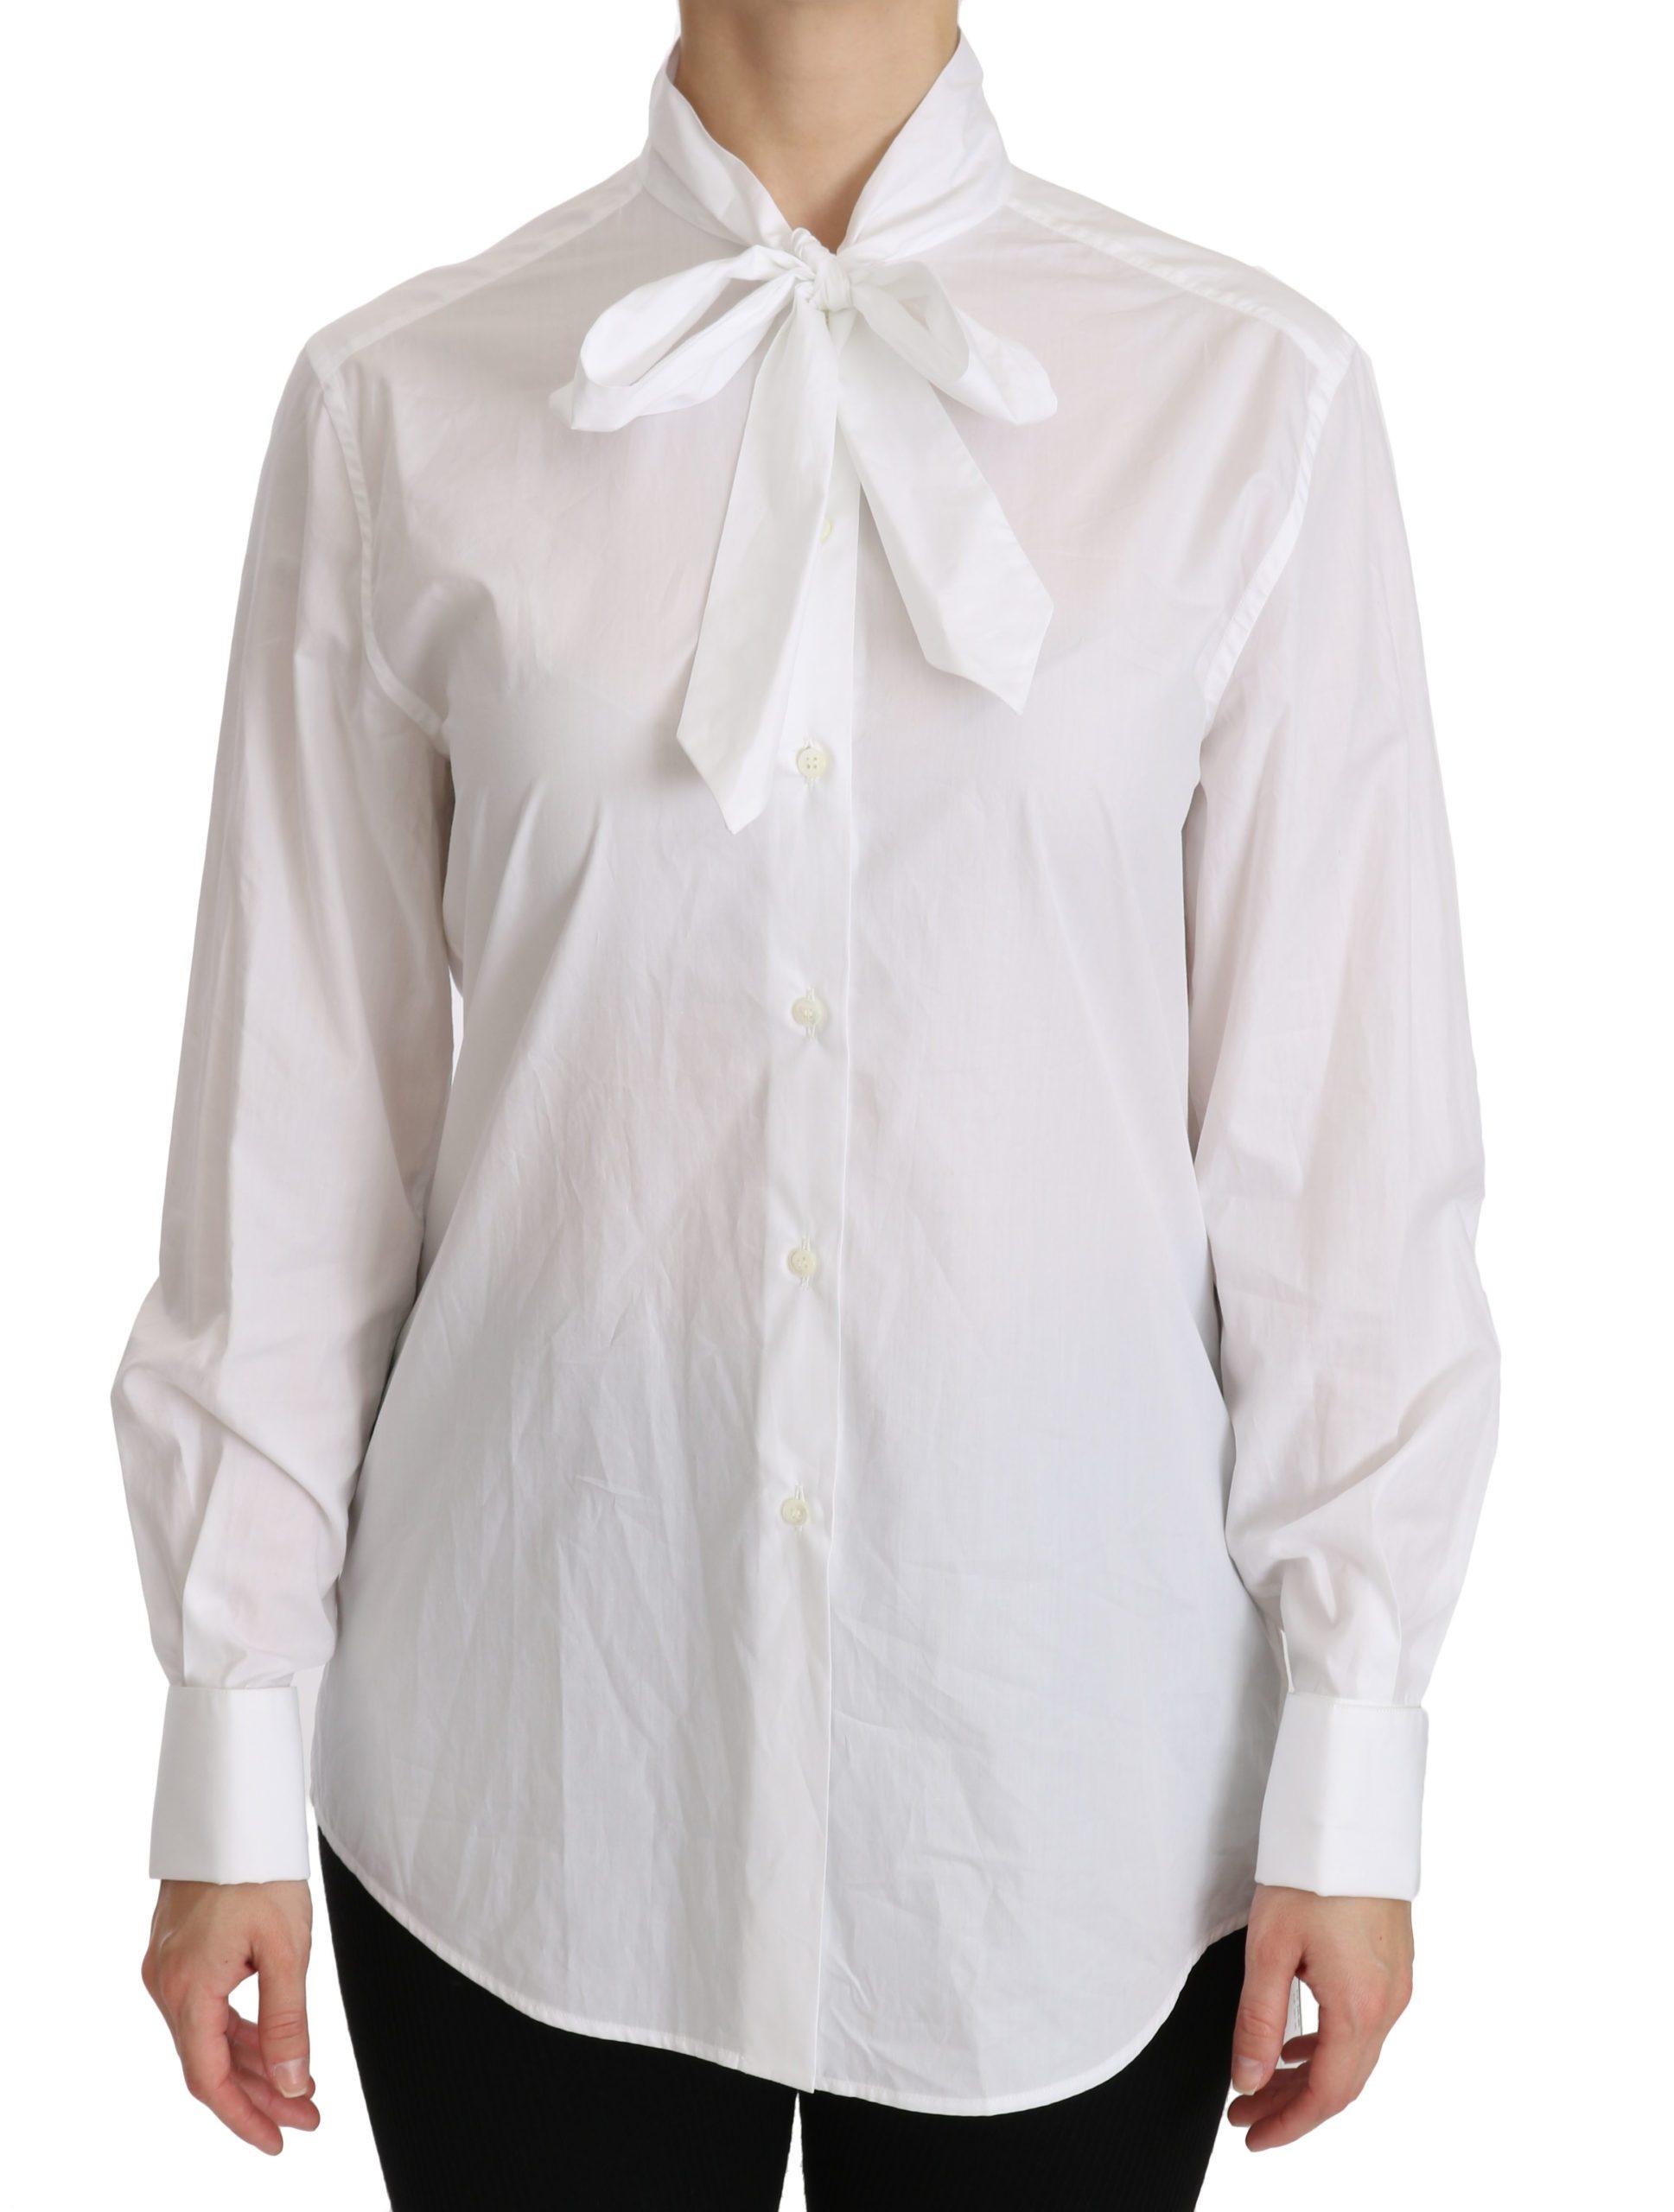 Dolce & Gabbana Women's Long Sleeve Polo Shirt White TSH4321 - IT46|XL